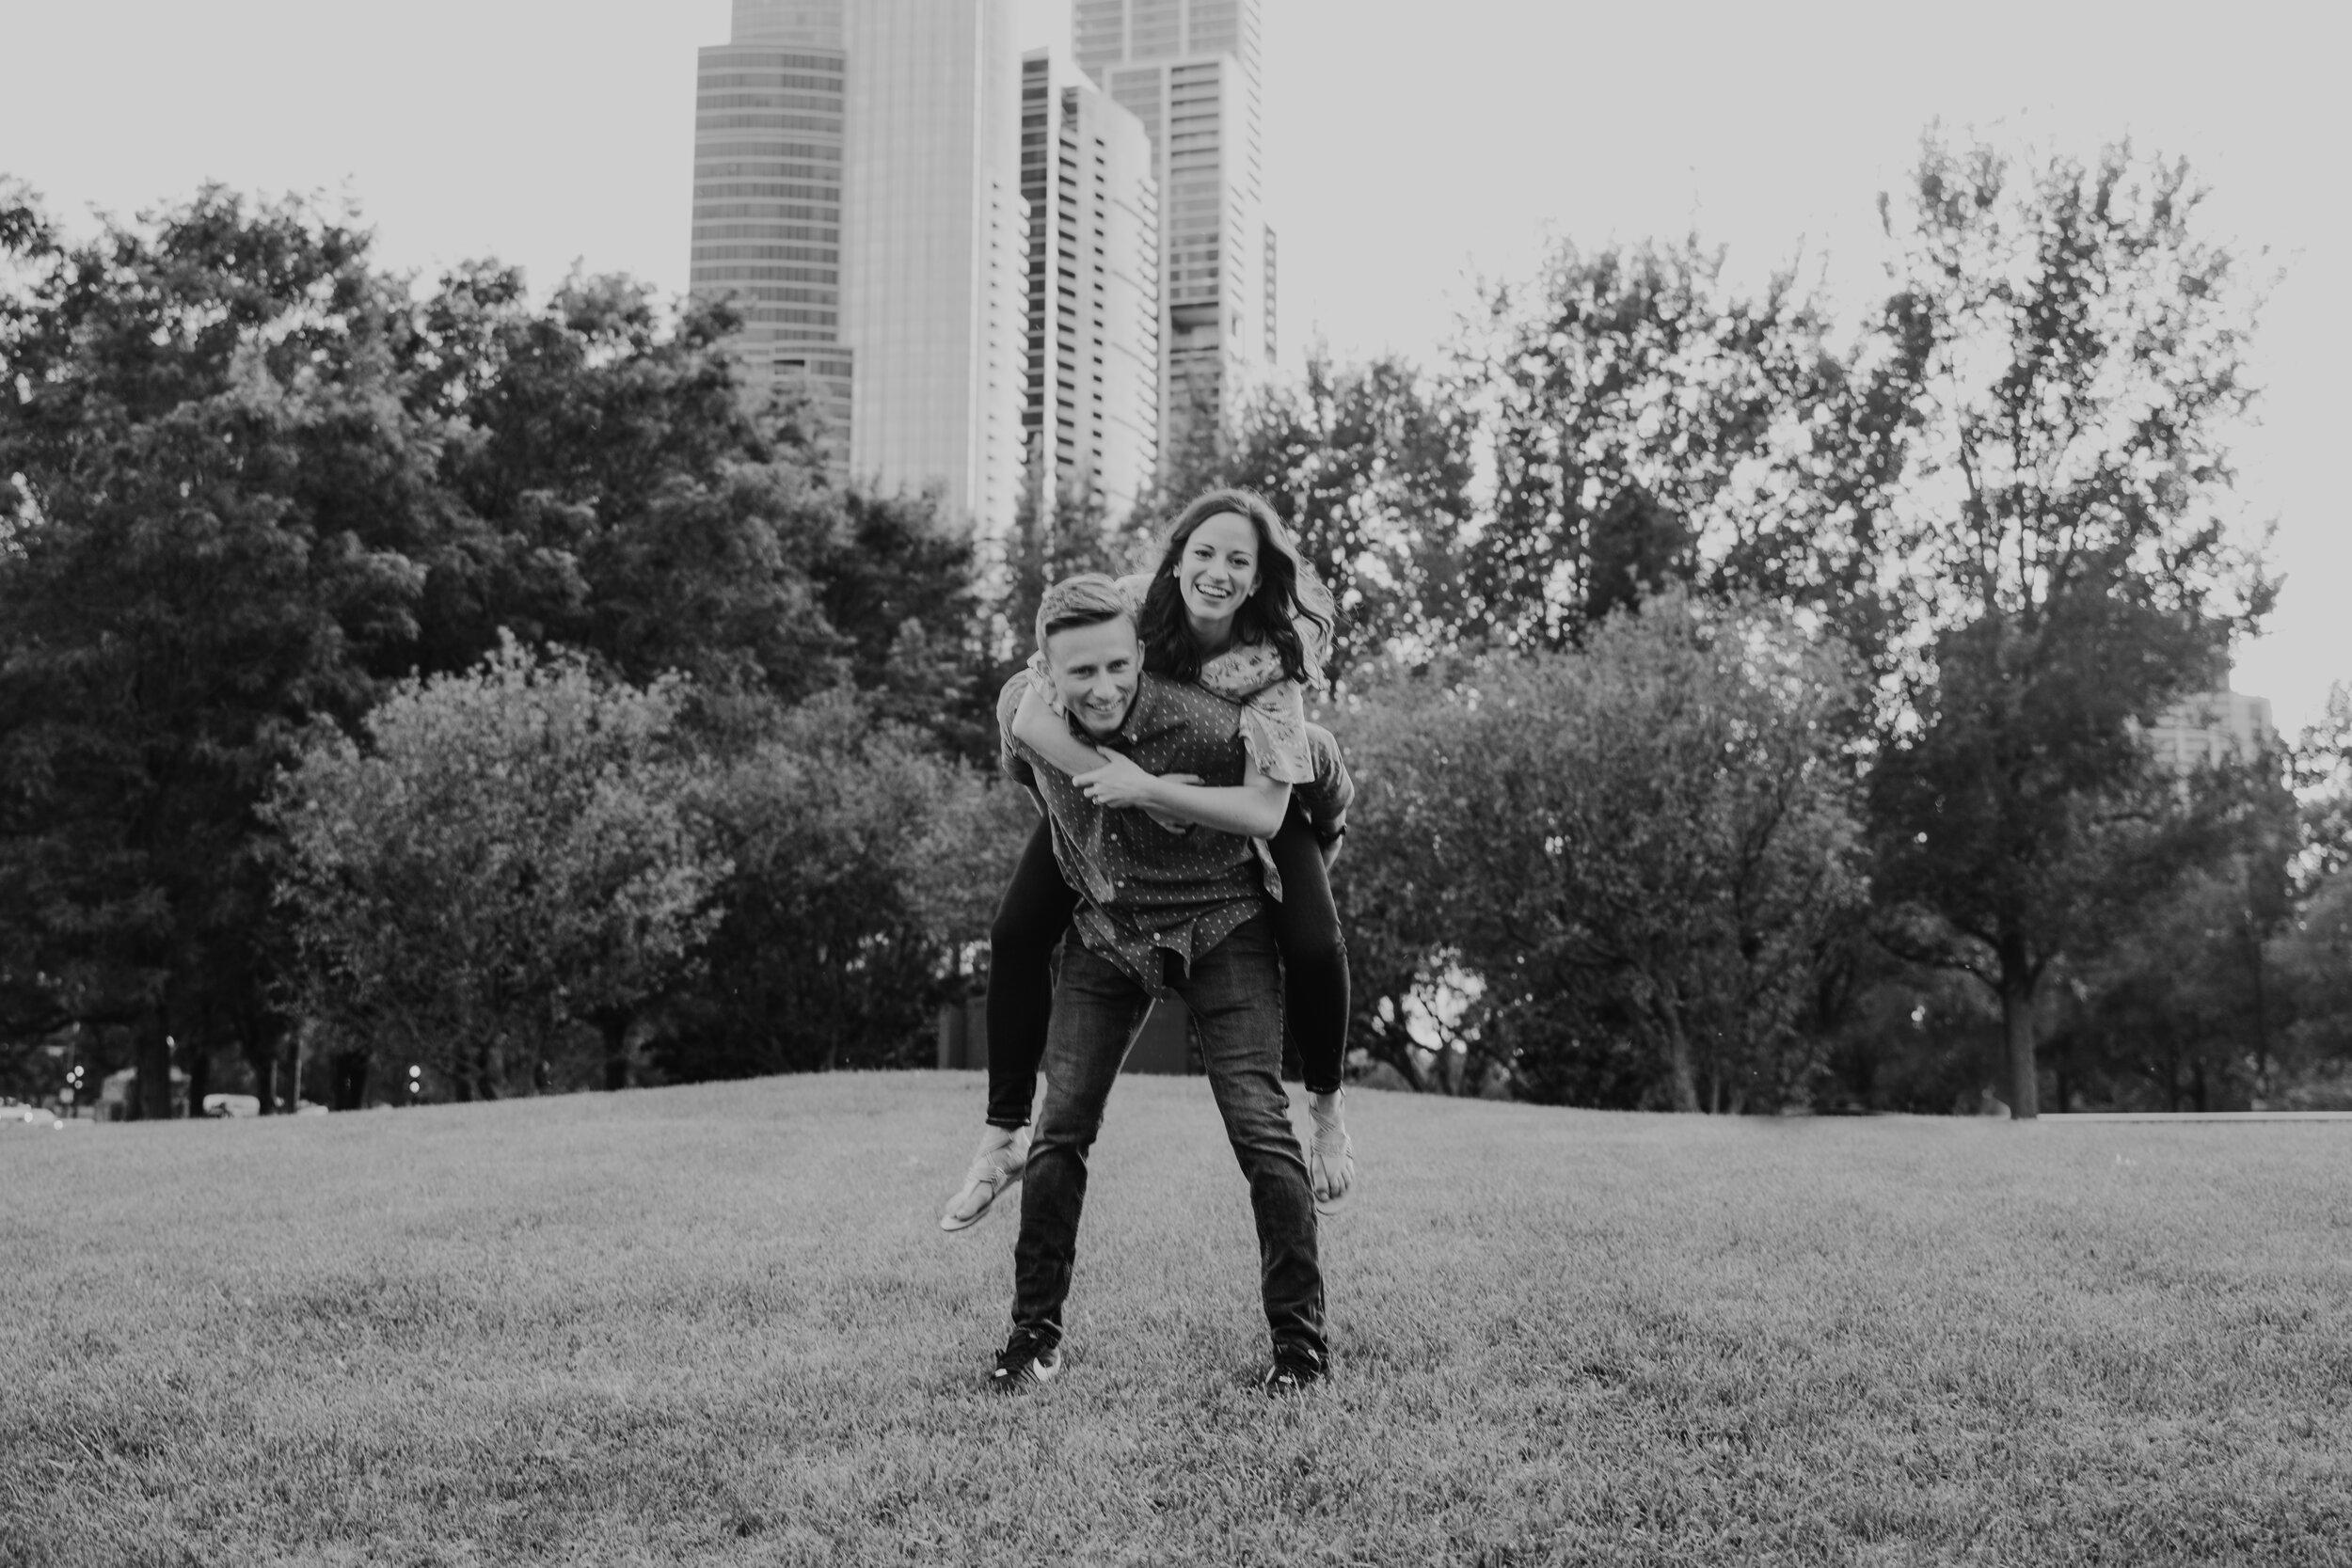 Erin & Jeff Engagement Photos - Datflipmel Photo & Films--2.jpg